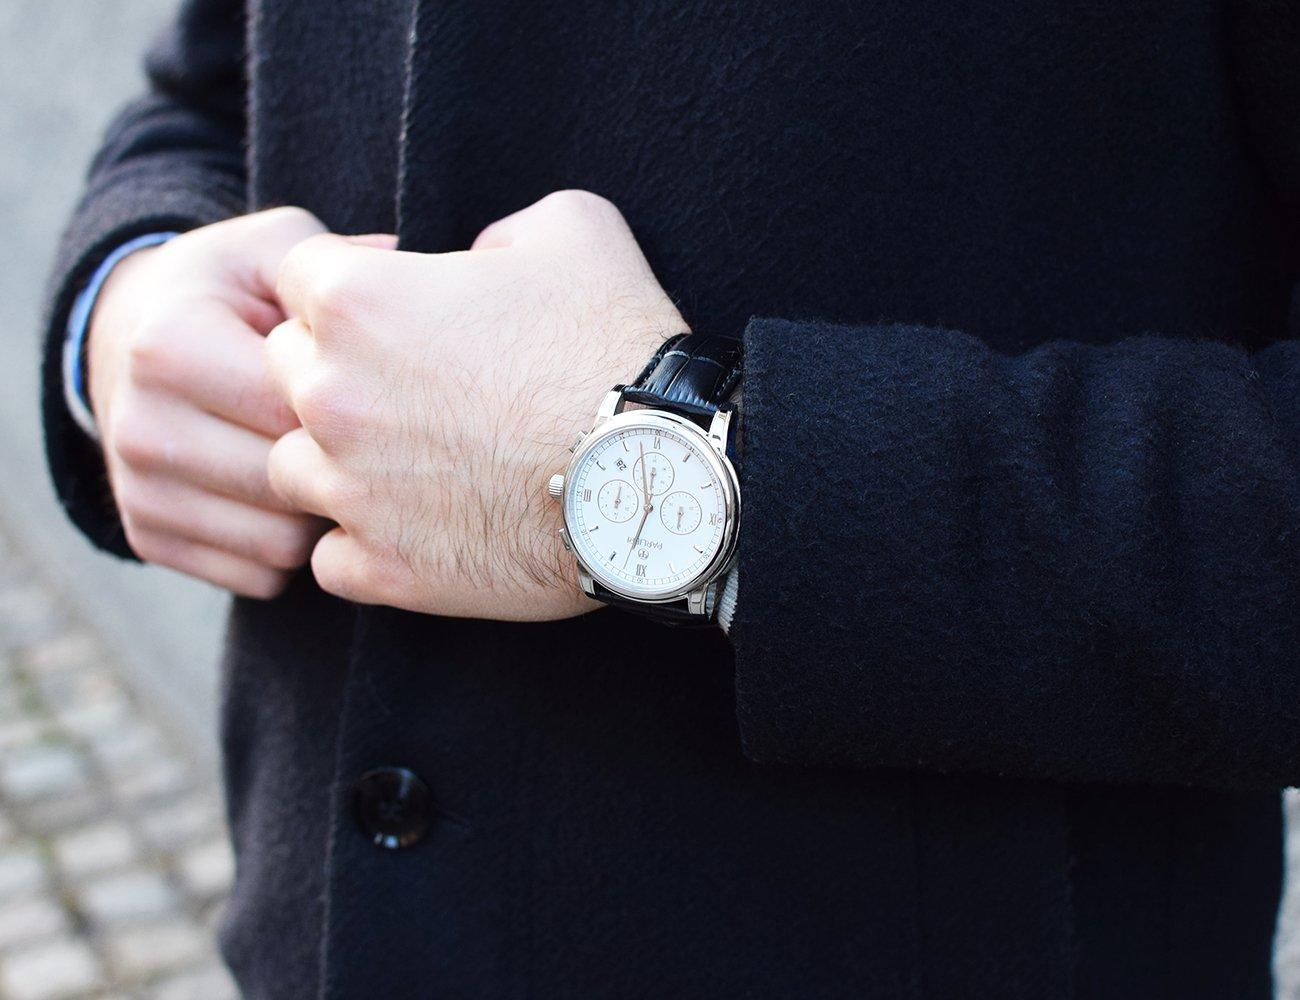 Parlieri Affordable Premium Watches